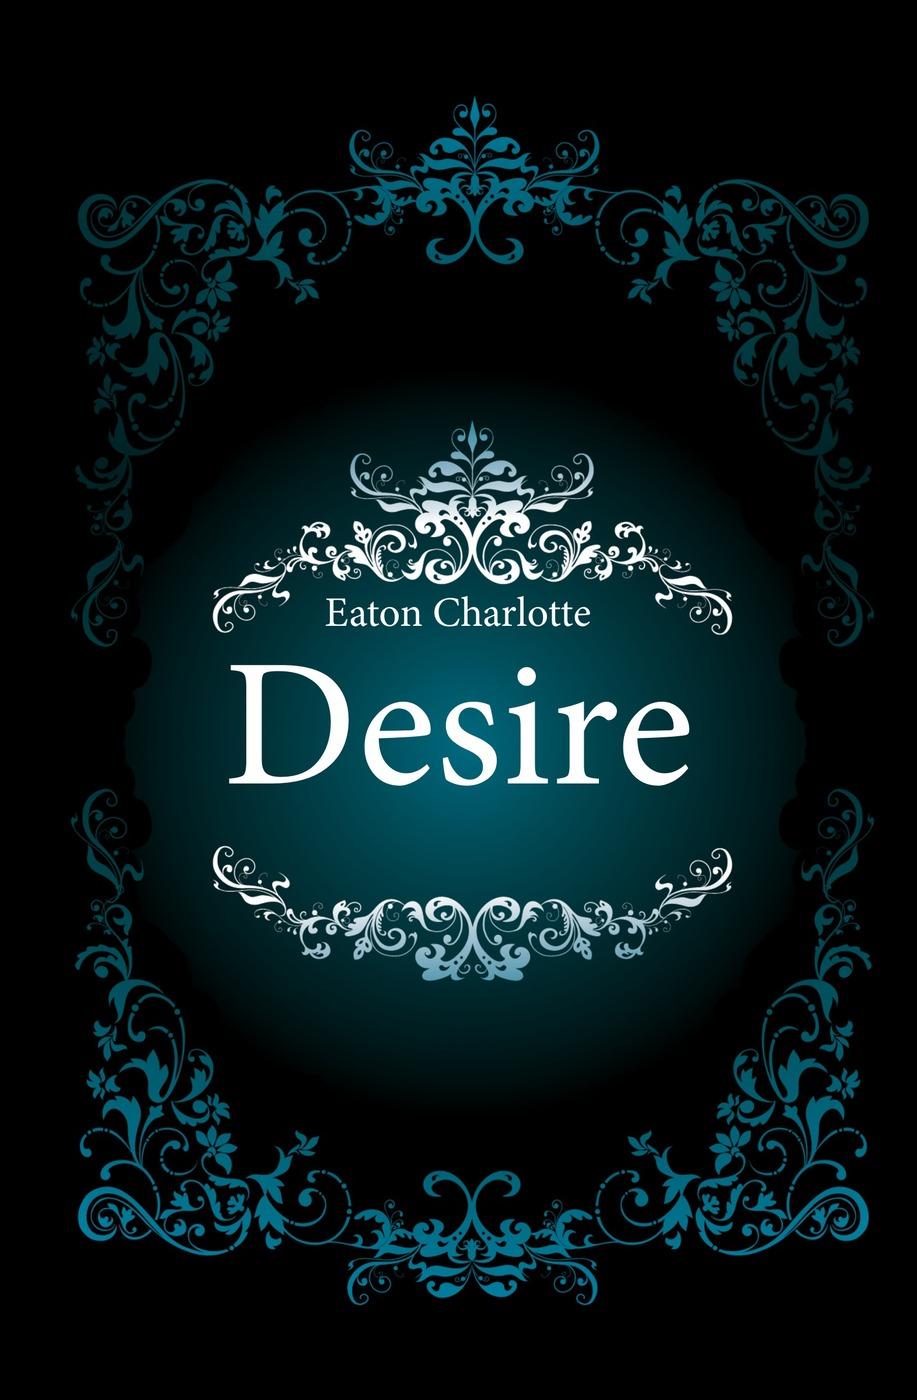 Eaton Charlotte Desire charlotte lamb angry desire